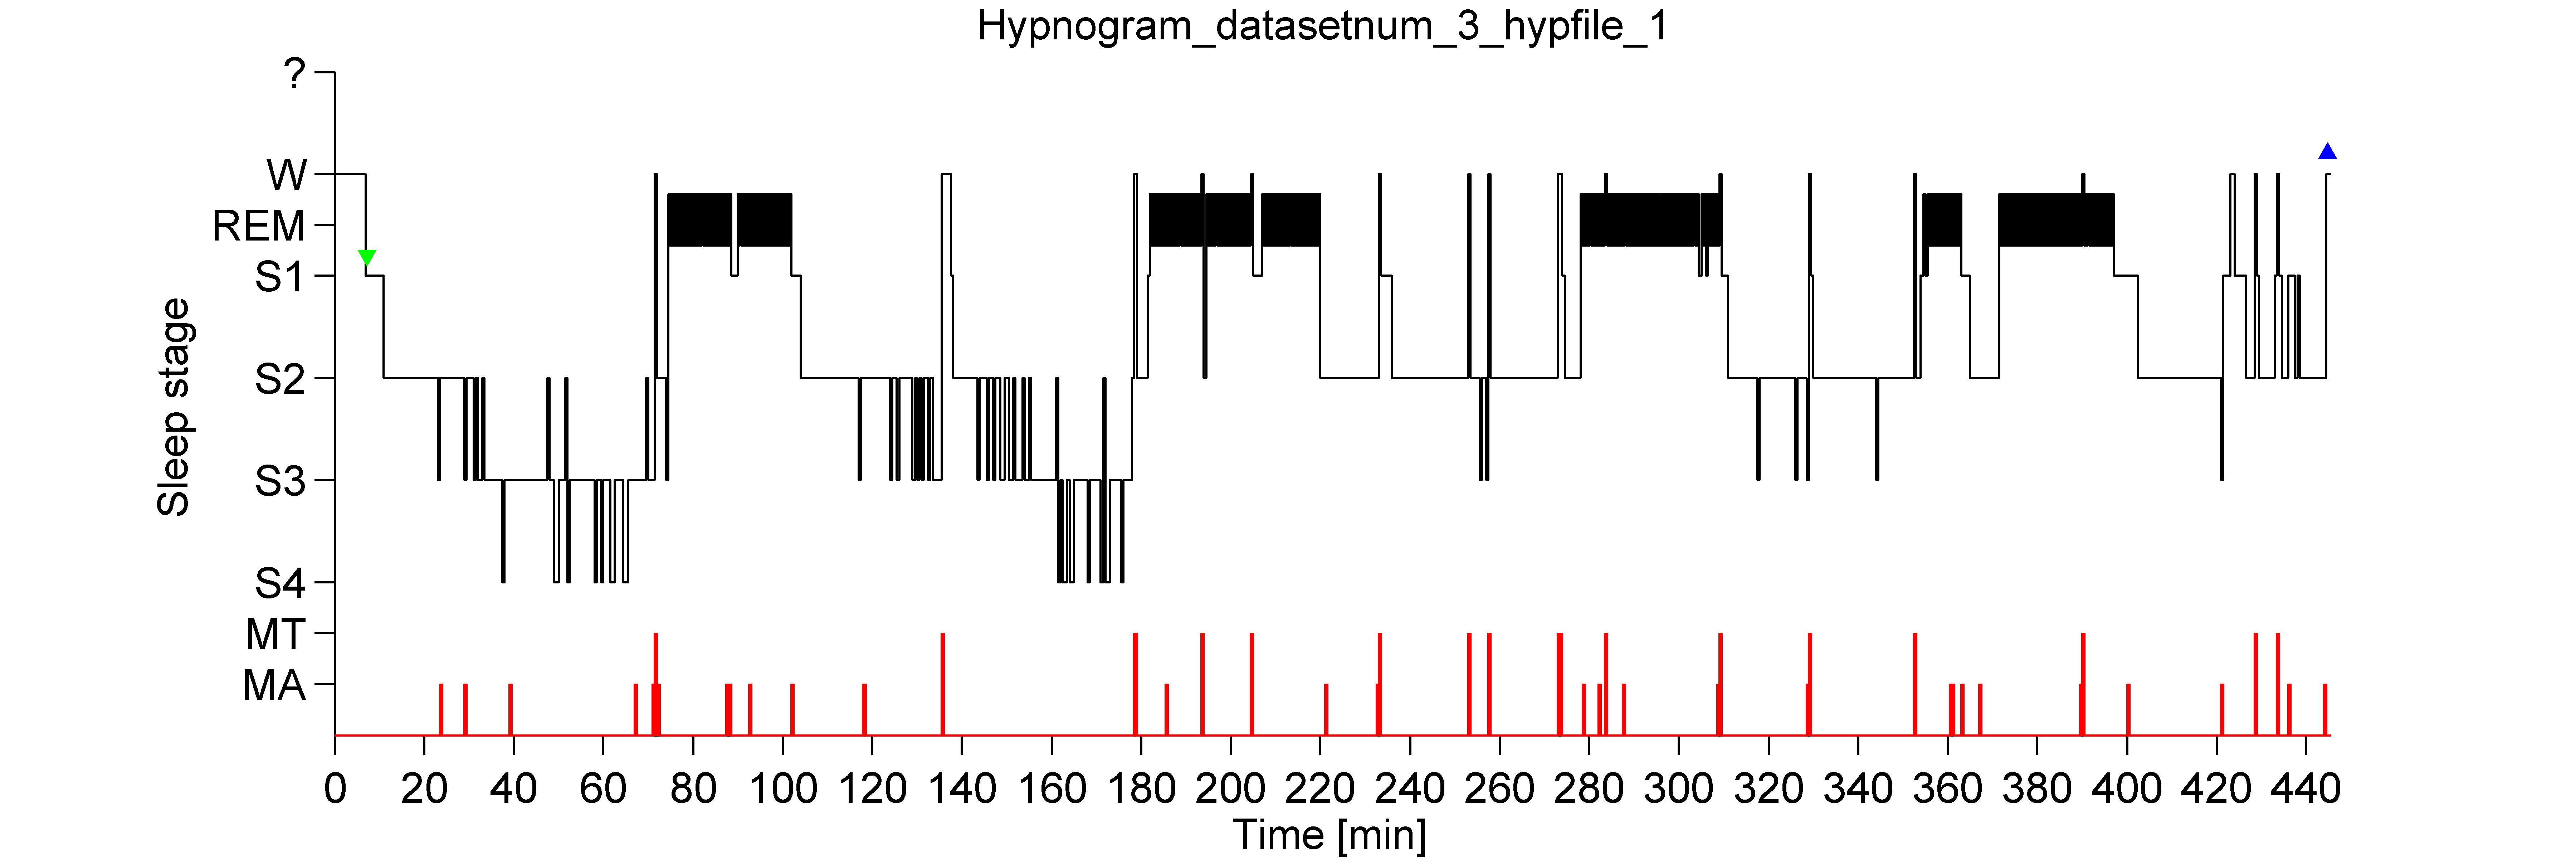 hypnogram_generated